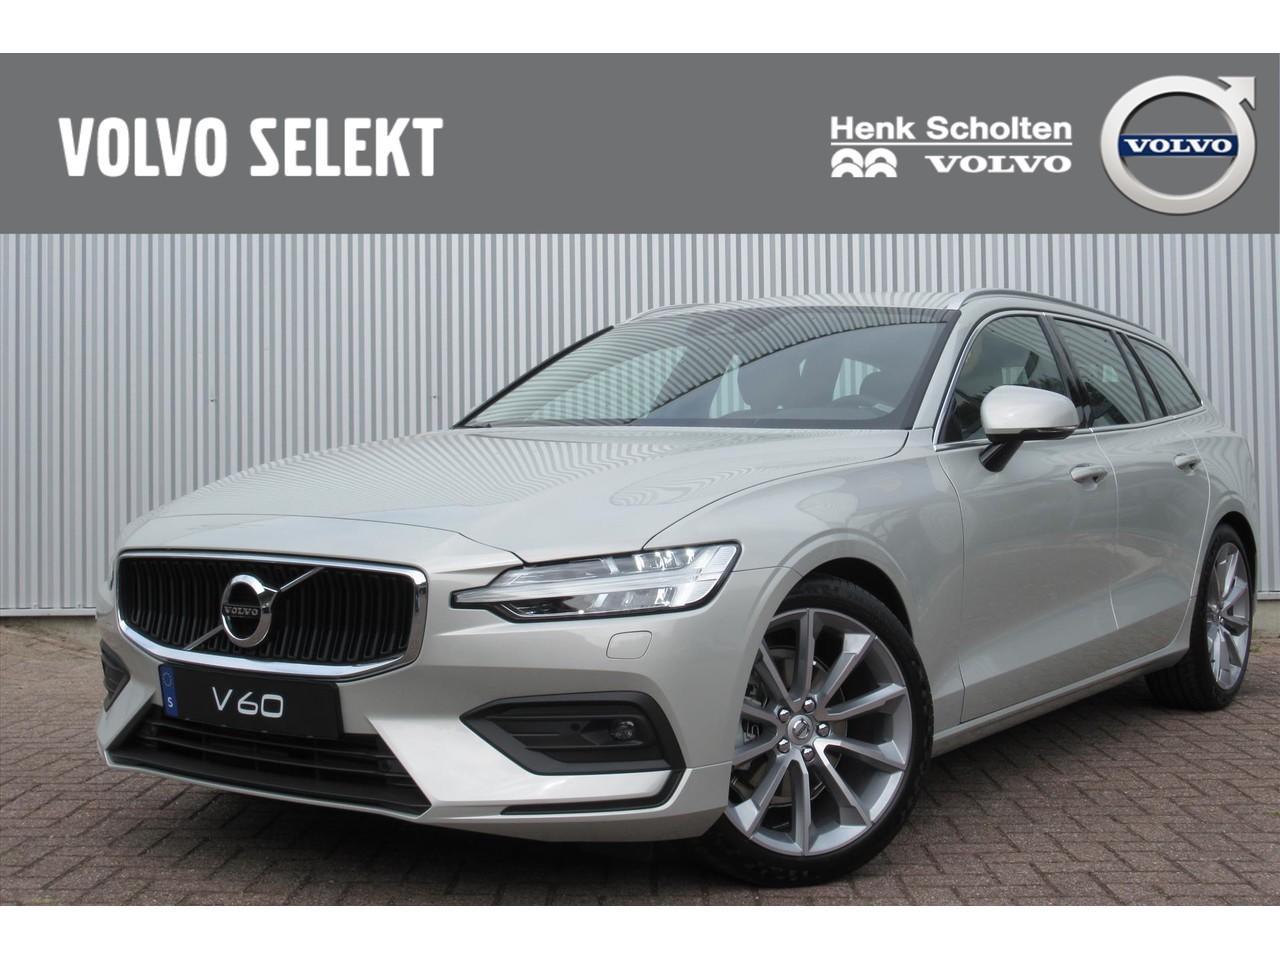 Volvo V60 D4 190pk gt navi parkeerverwarming park assist